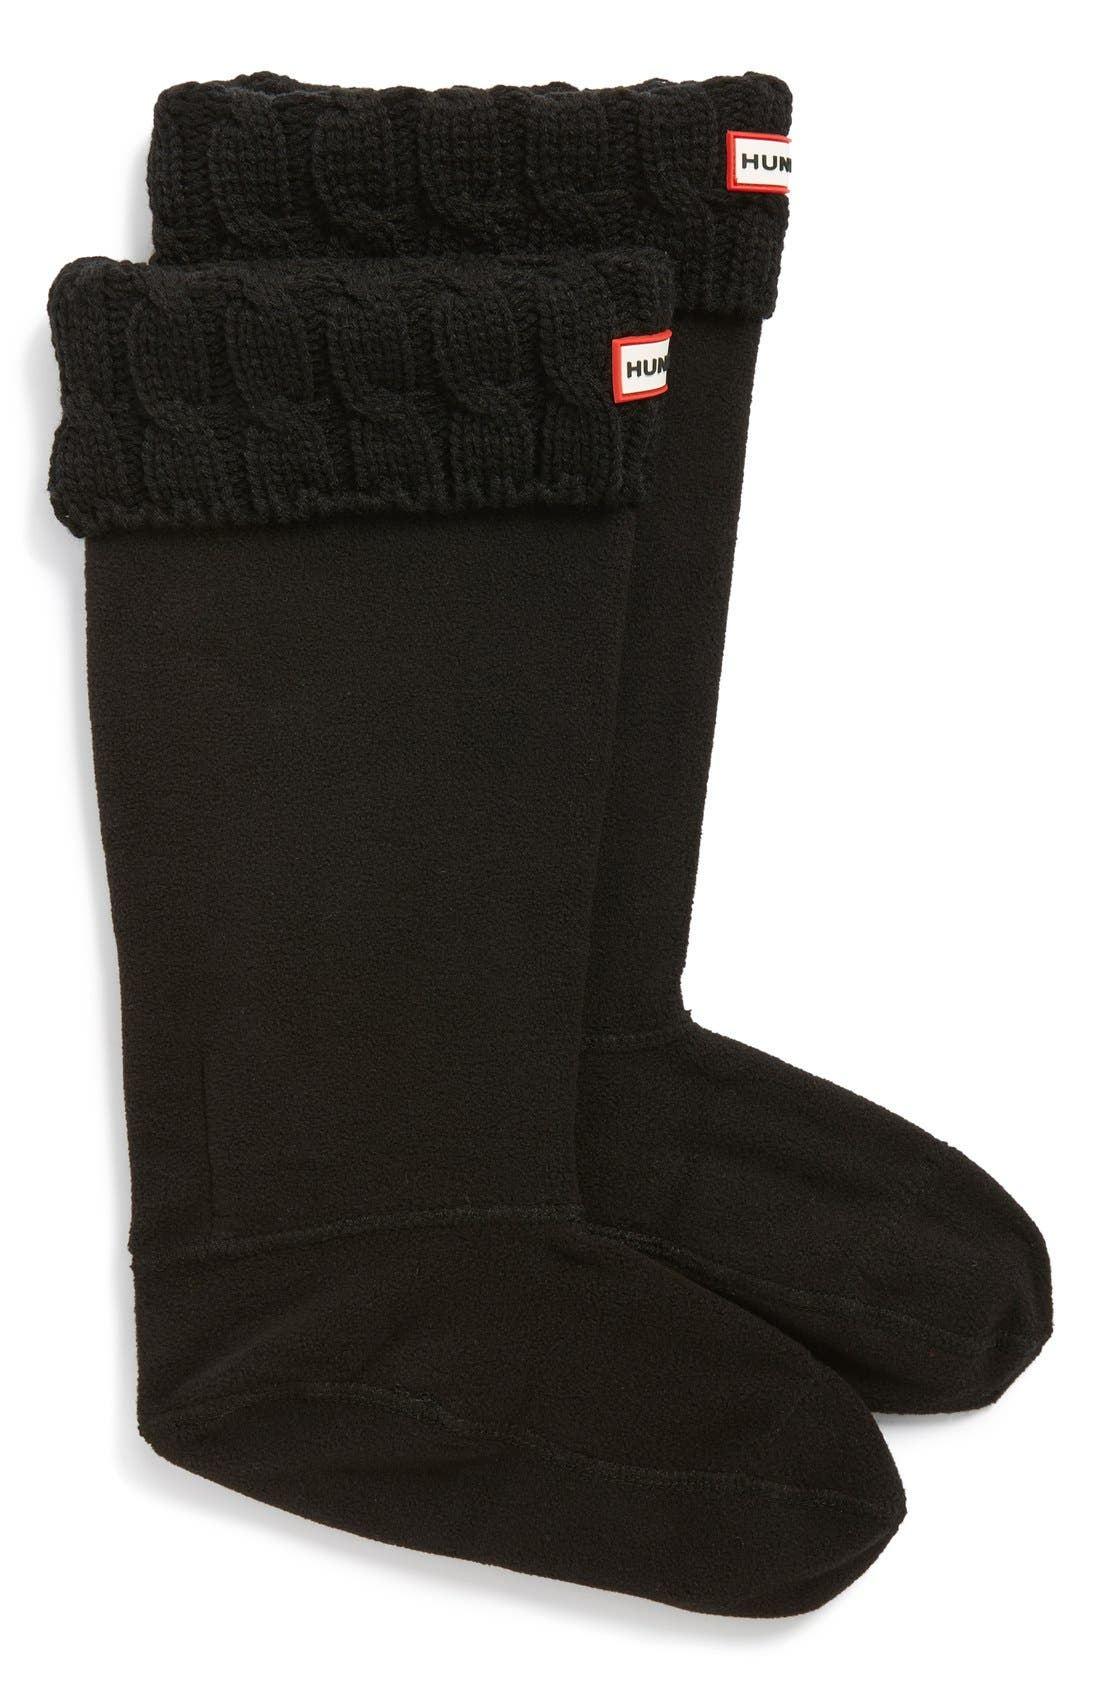 HUNTER, Original Tall Cable Knit Cuff Welly Boot Socks, Main thumbnail 1, color, BLACK